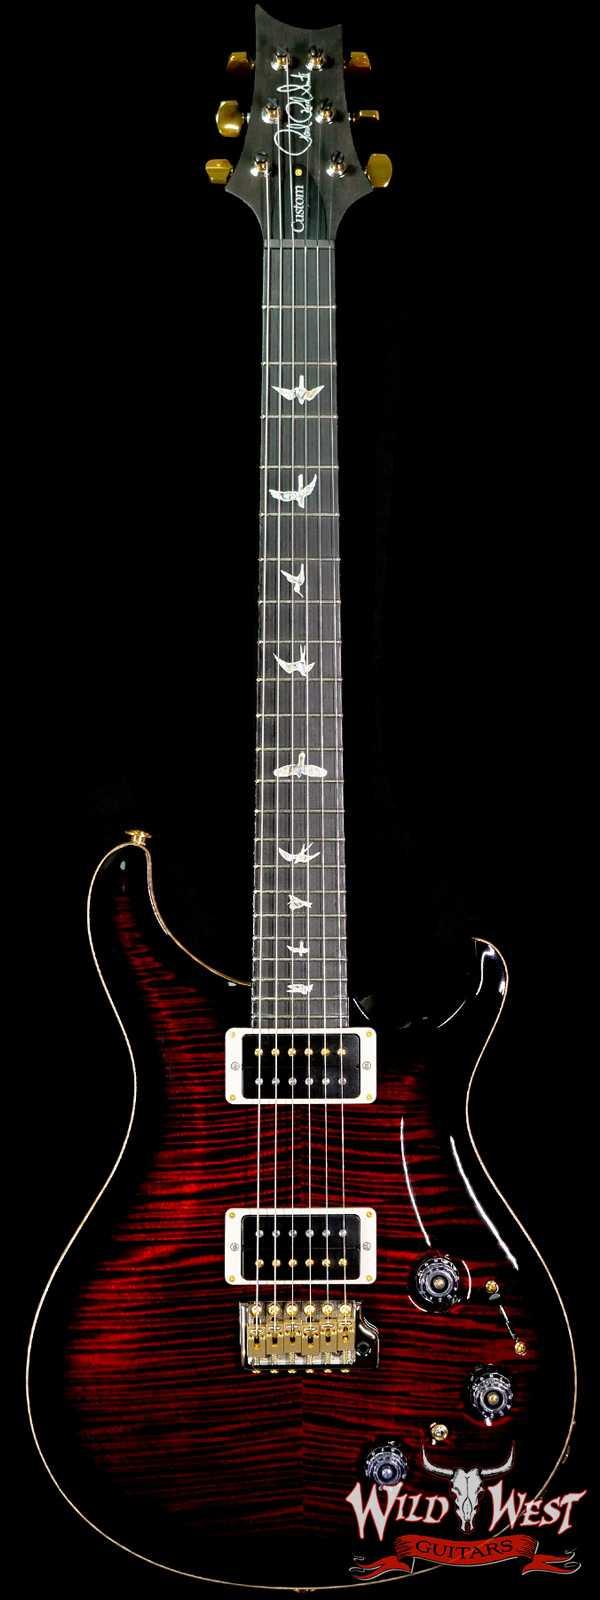 Paul Reed Smith PRS 10 Top Custom 22 Piezo P22 Ebony Fingerboard Fire Red Smokeburst